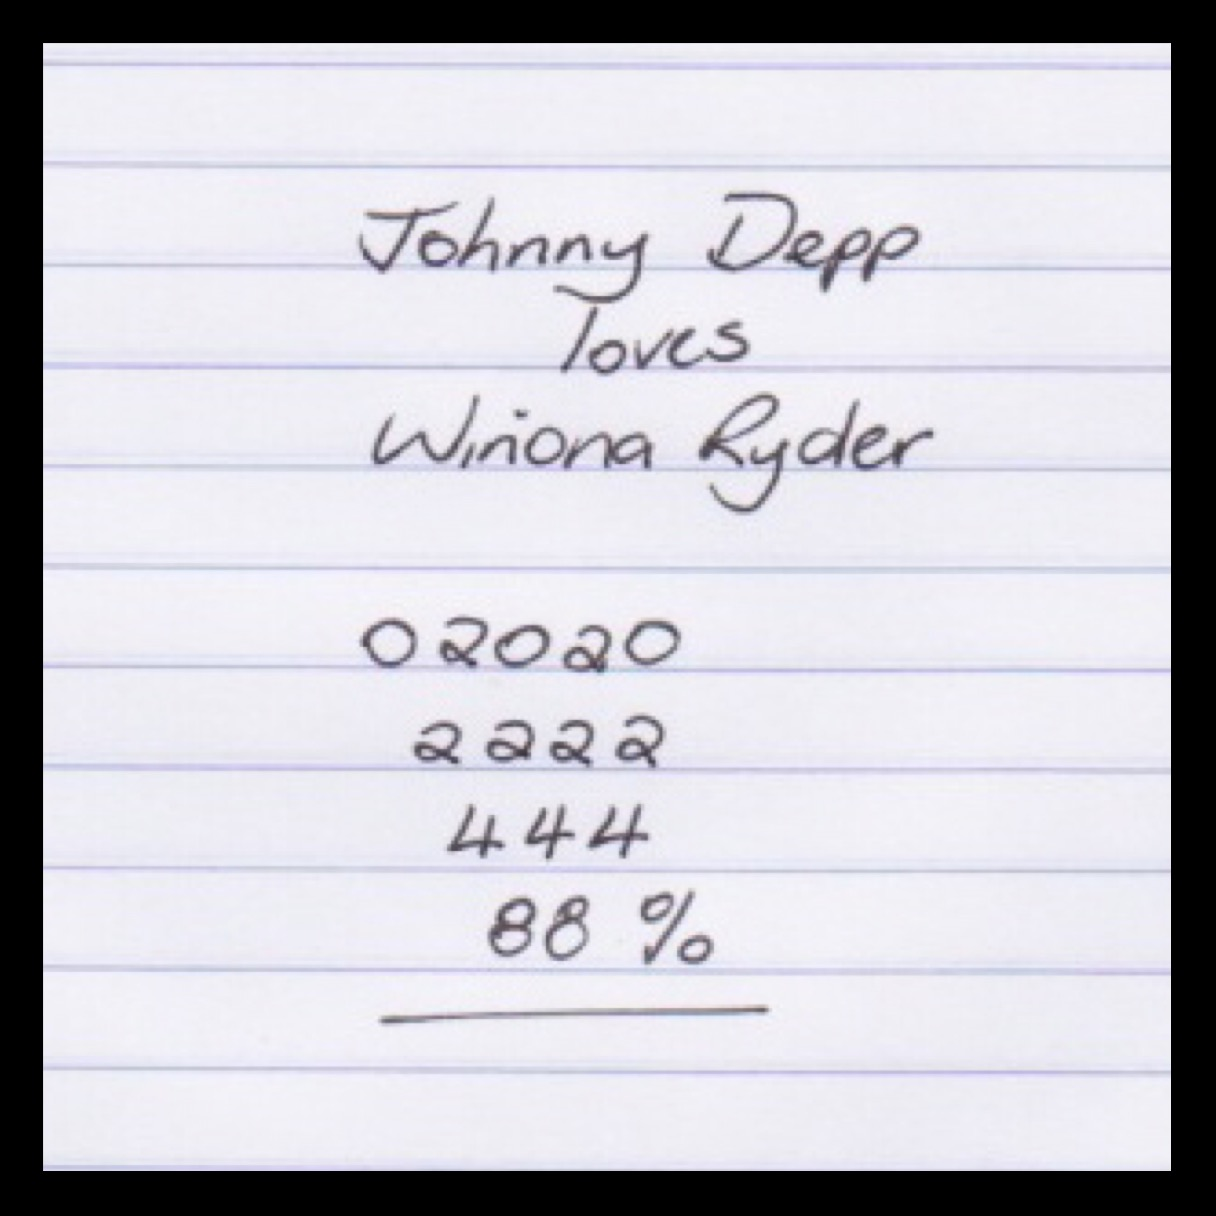 Depp & Ryder.JPG